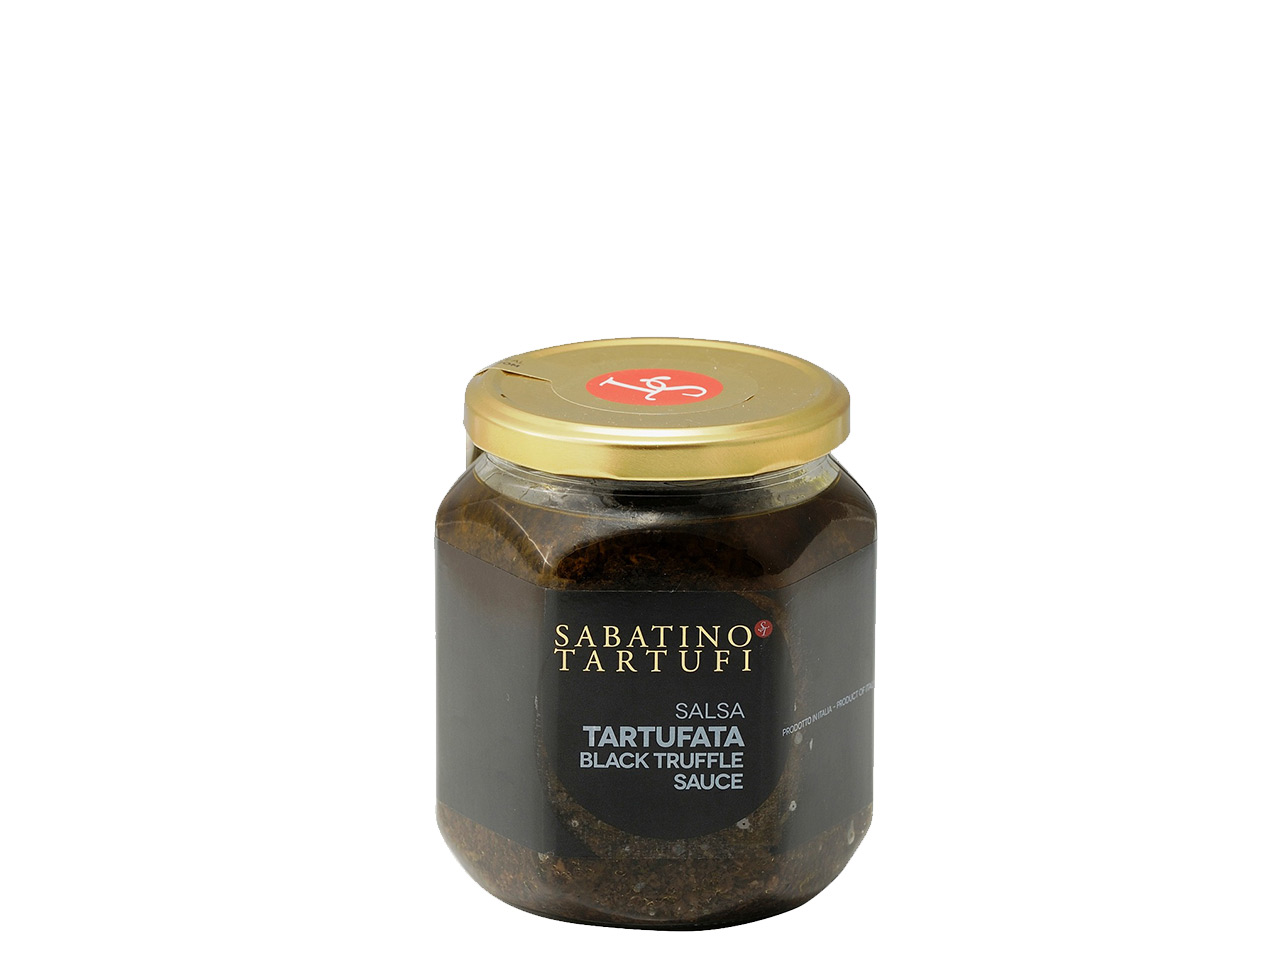 Sabatino Black Truffle Sauce 500gm